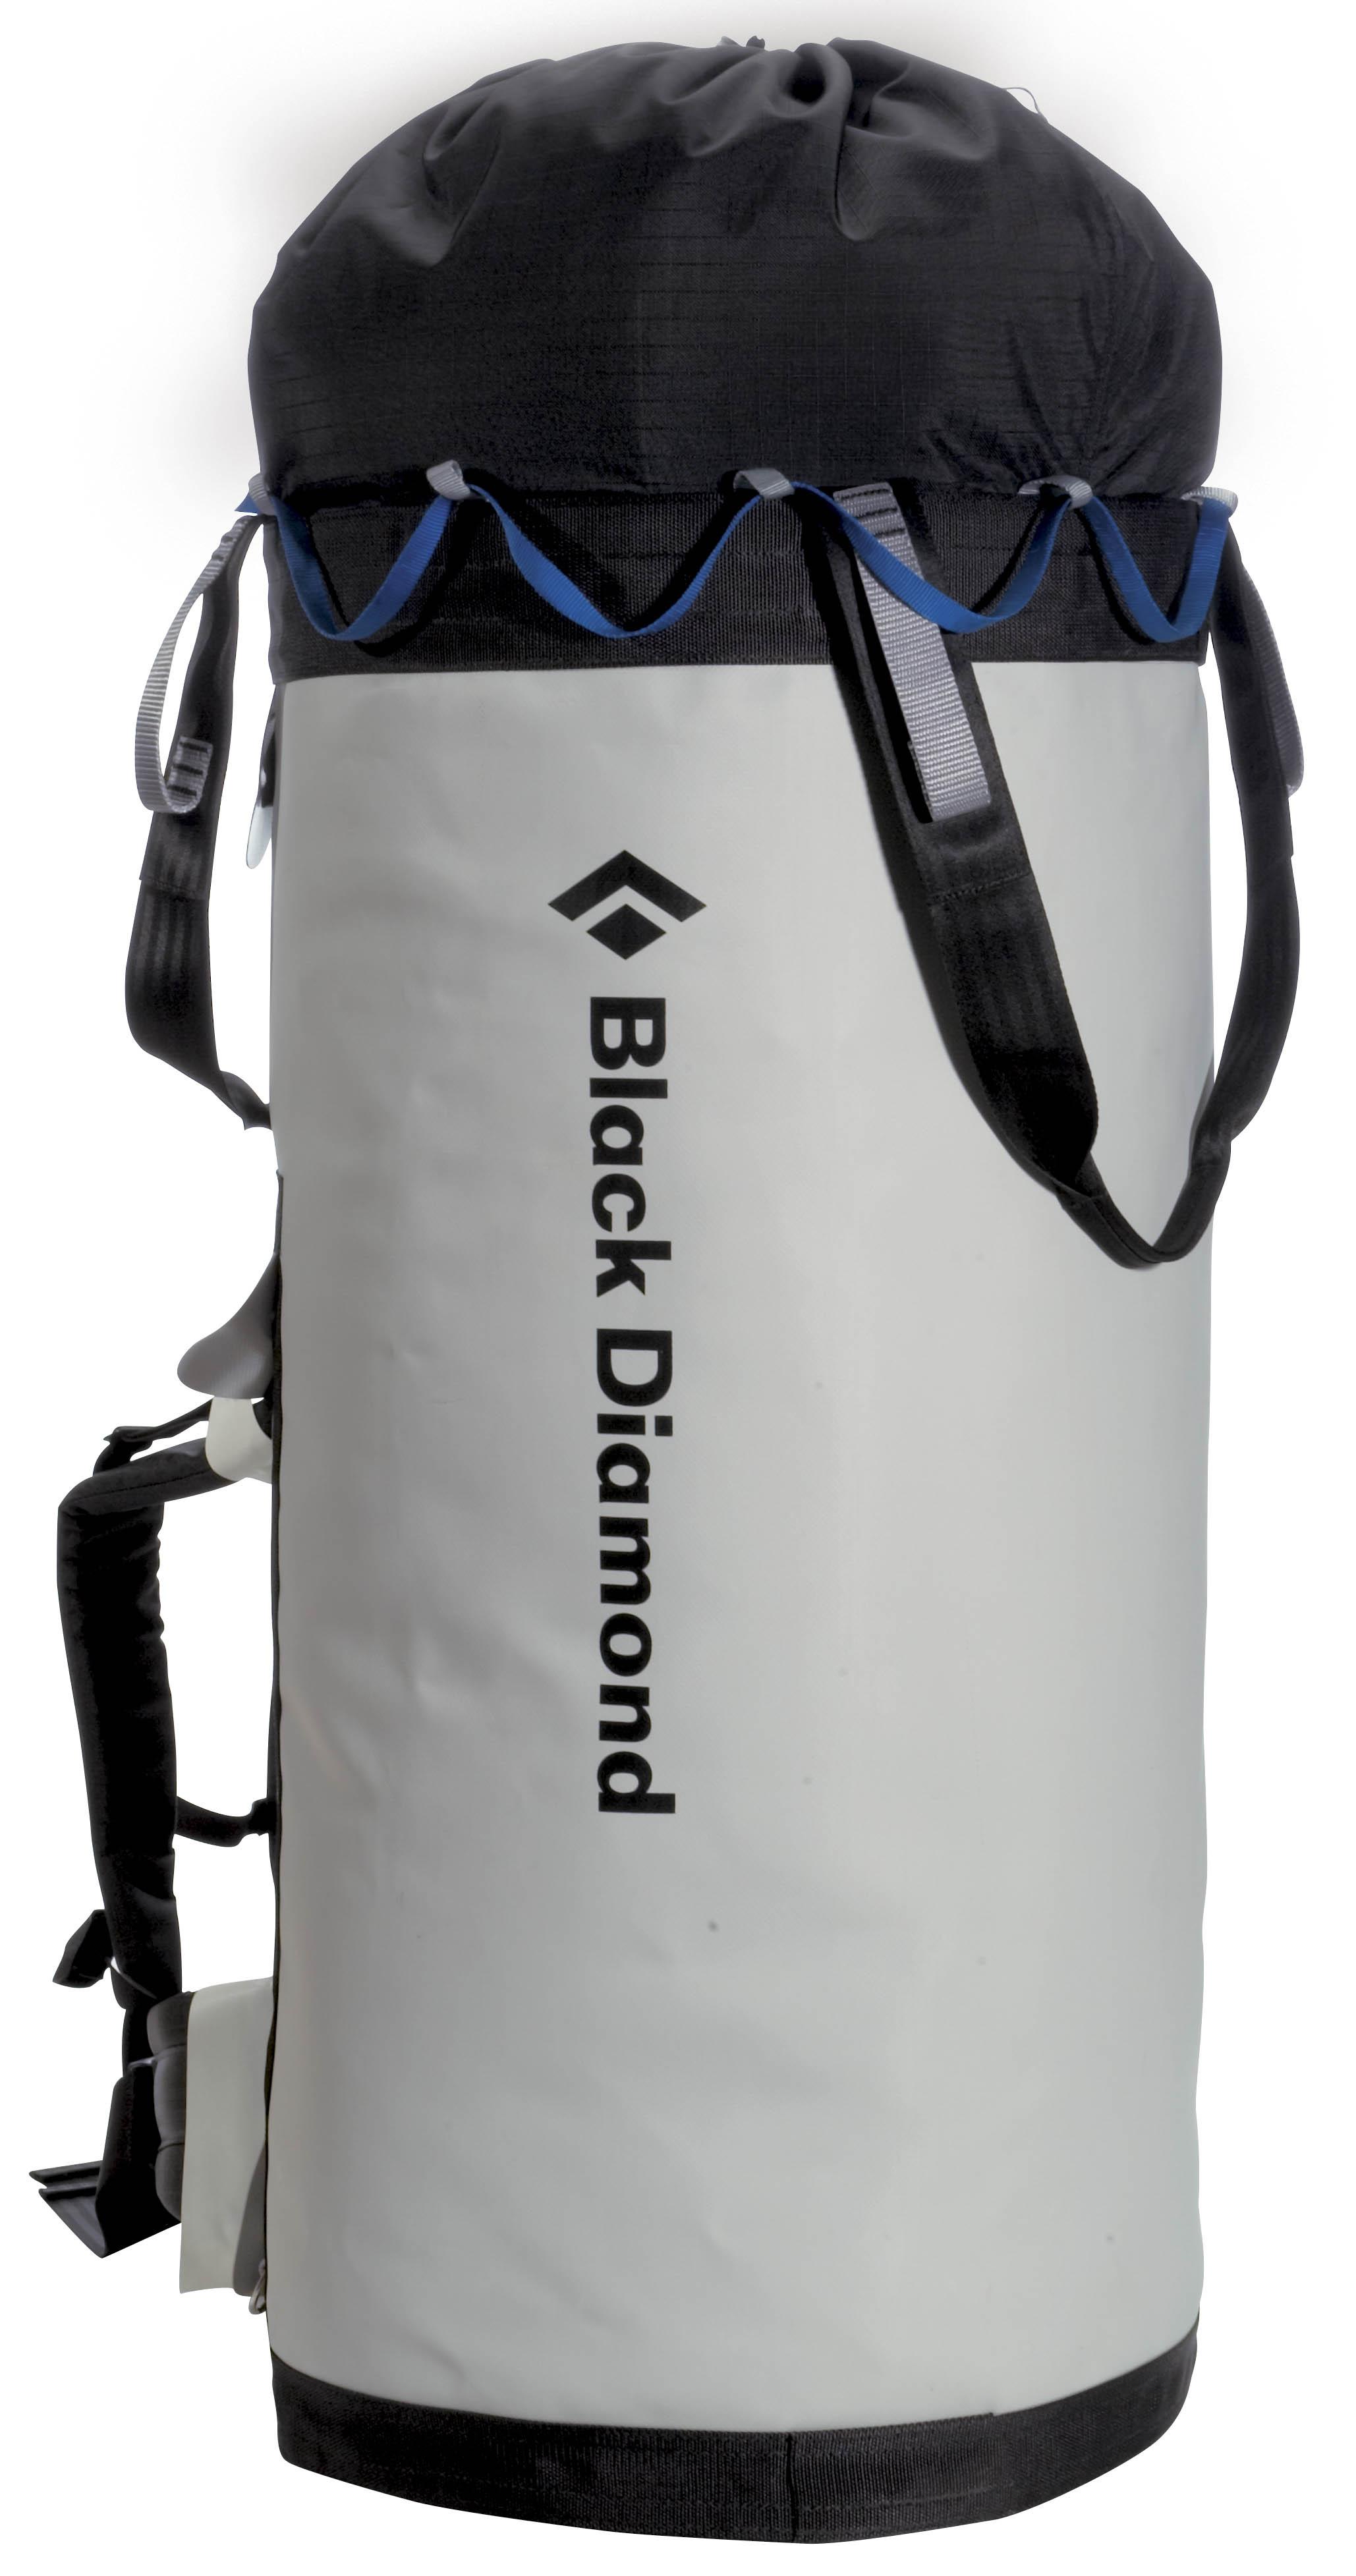 Black Diamond Zion 145 Haul Bag - Sac de hissage